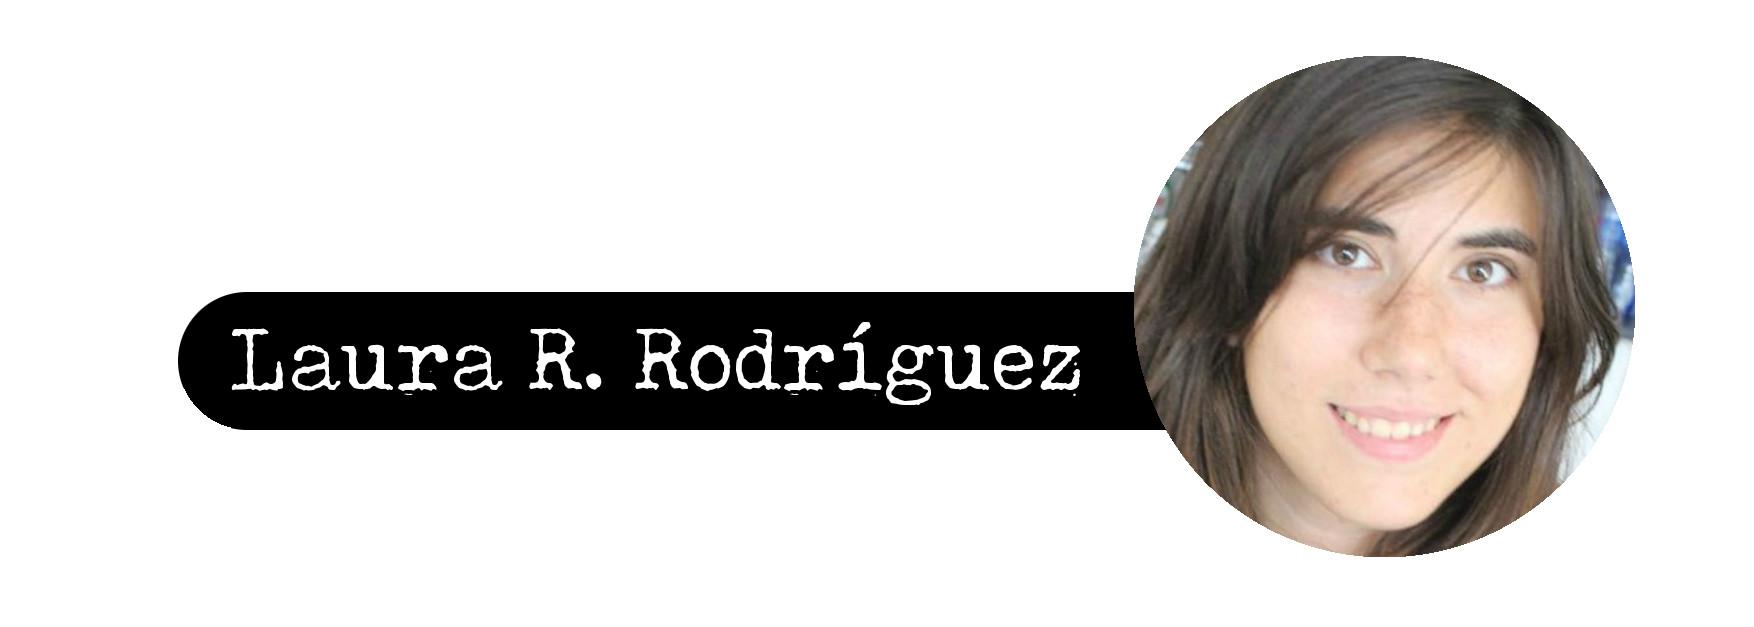 Laura R. Rodríguez